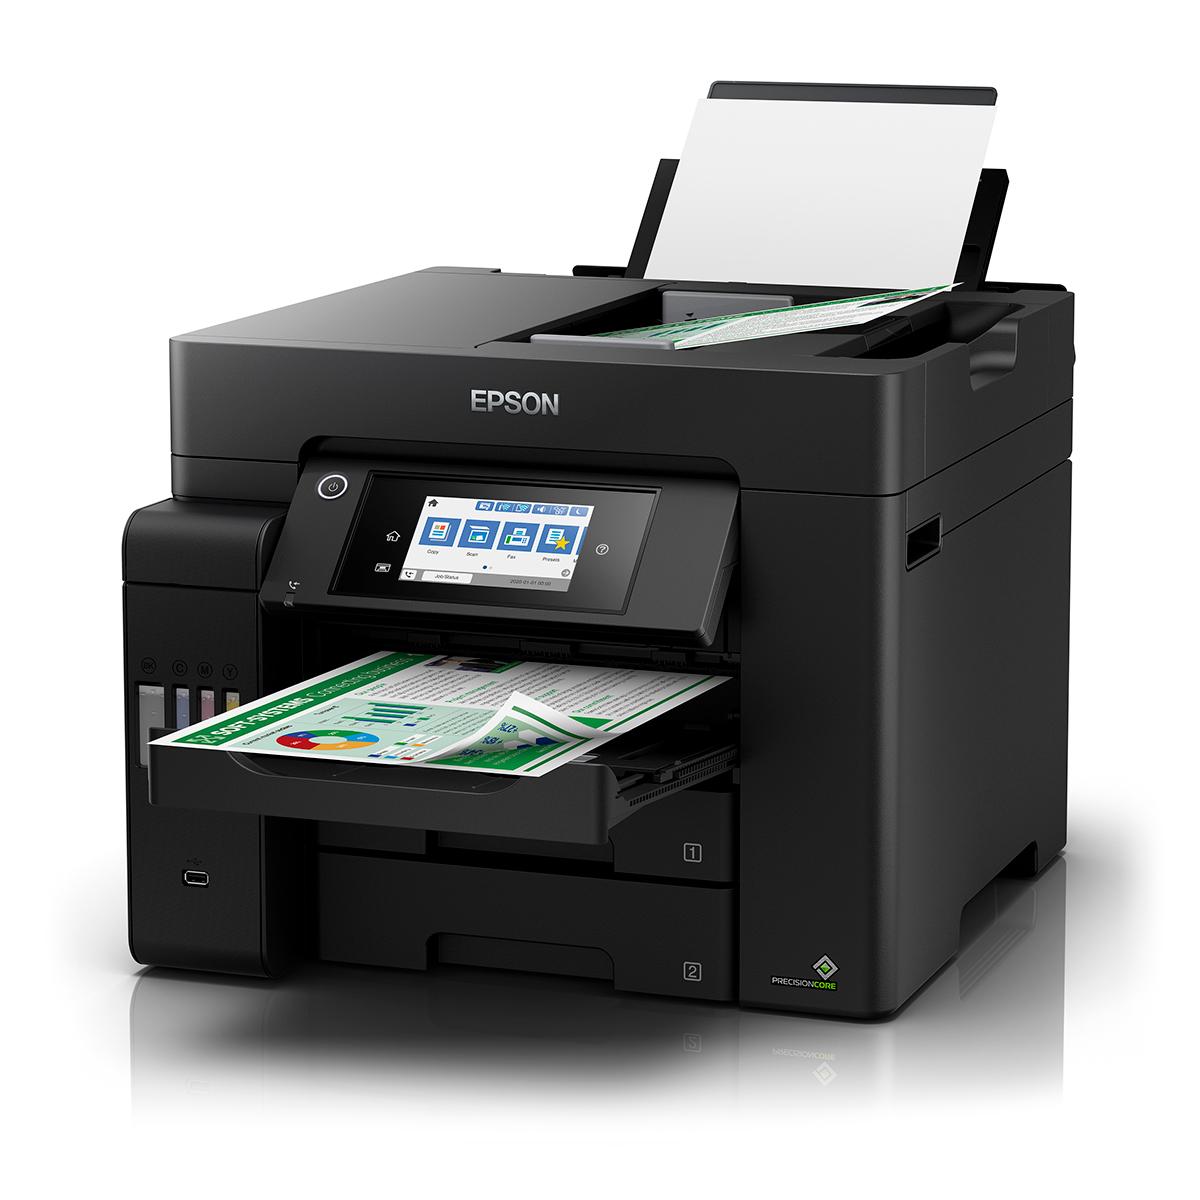 Epson EcoTank ET-5800 A4 Colour Inkjet Multifunction